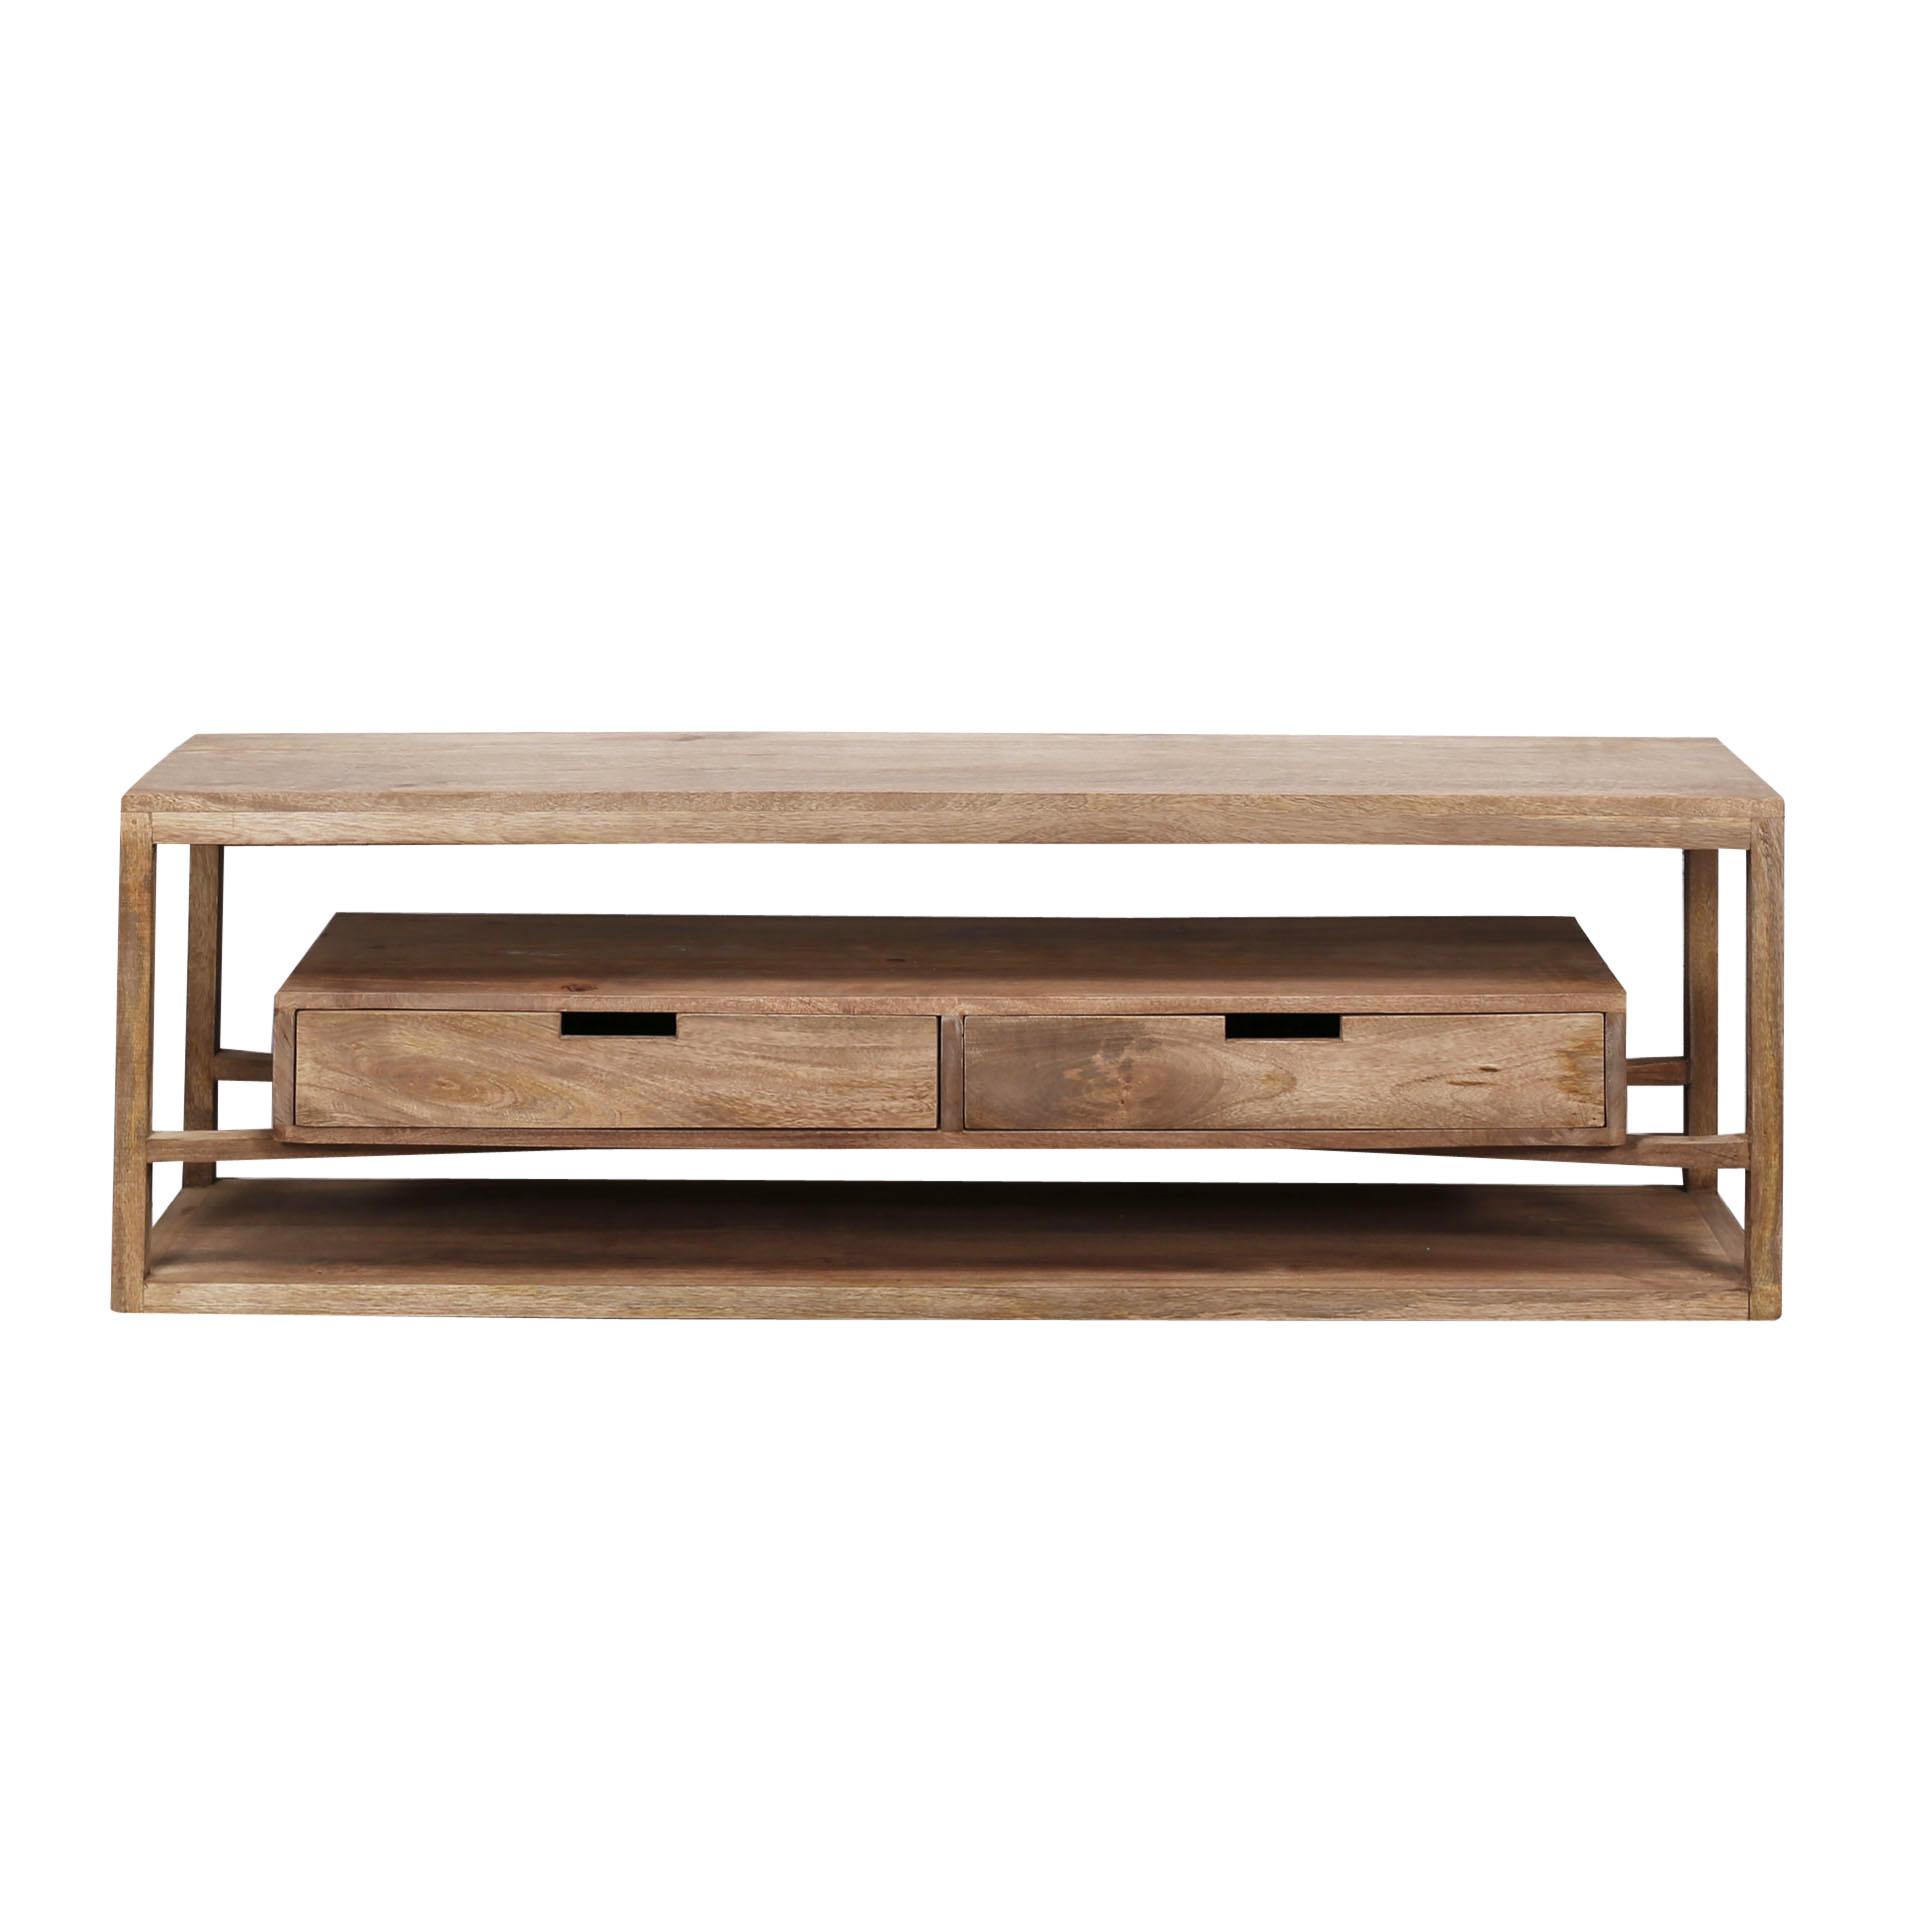 Duverger Sands - TV-meubel - massieve mango - zandkleur - 2 lades - L 140cm